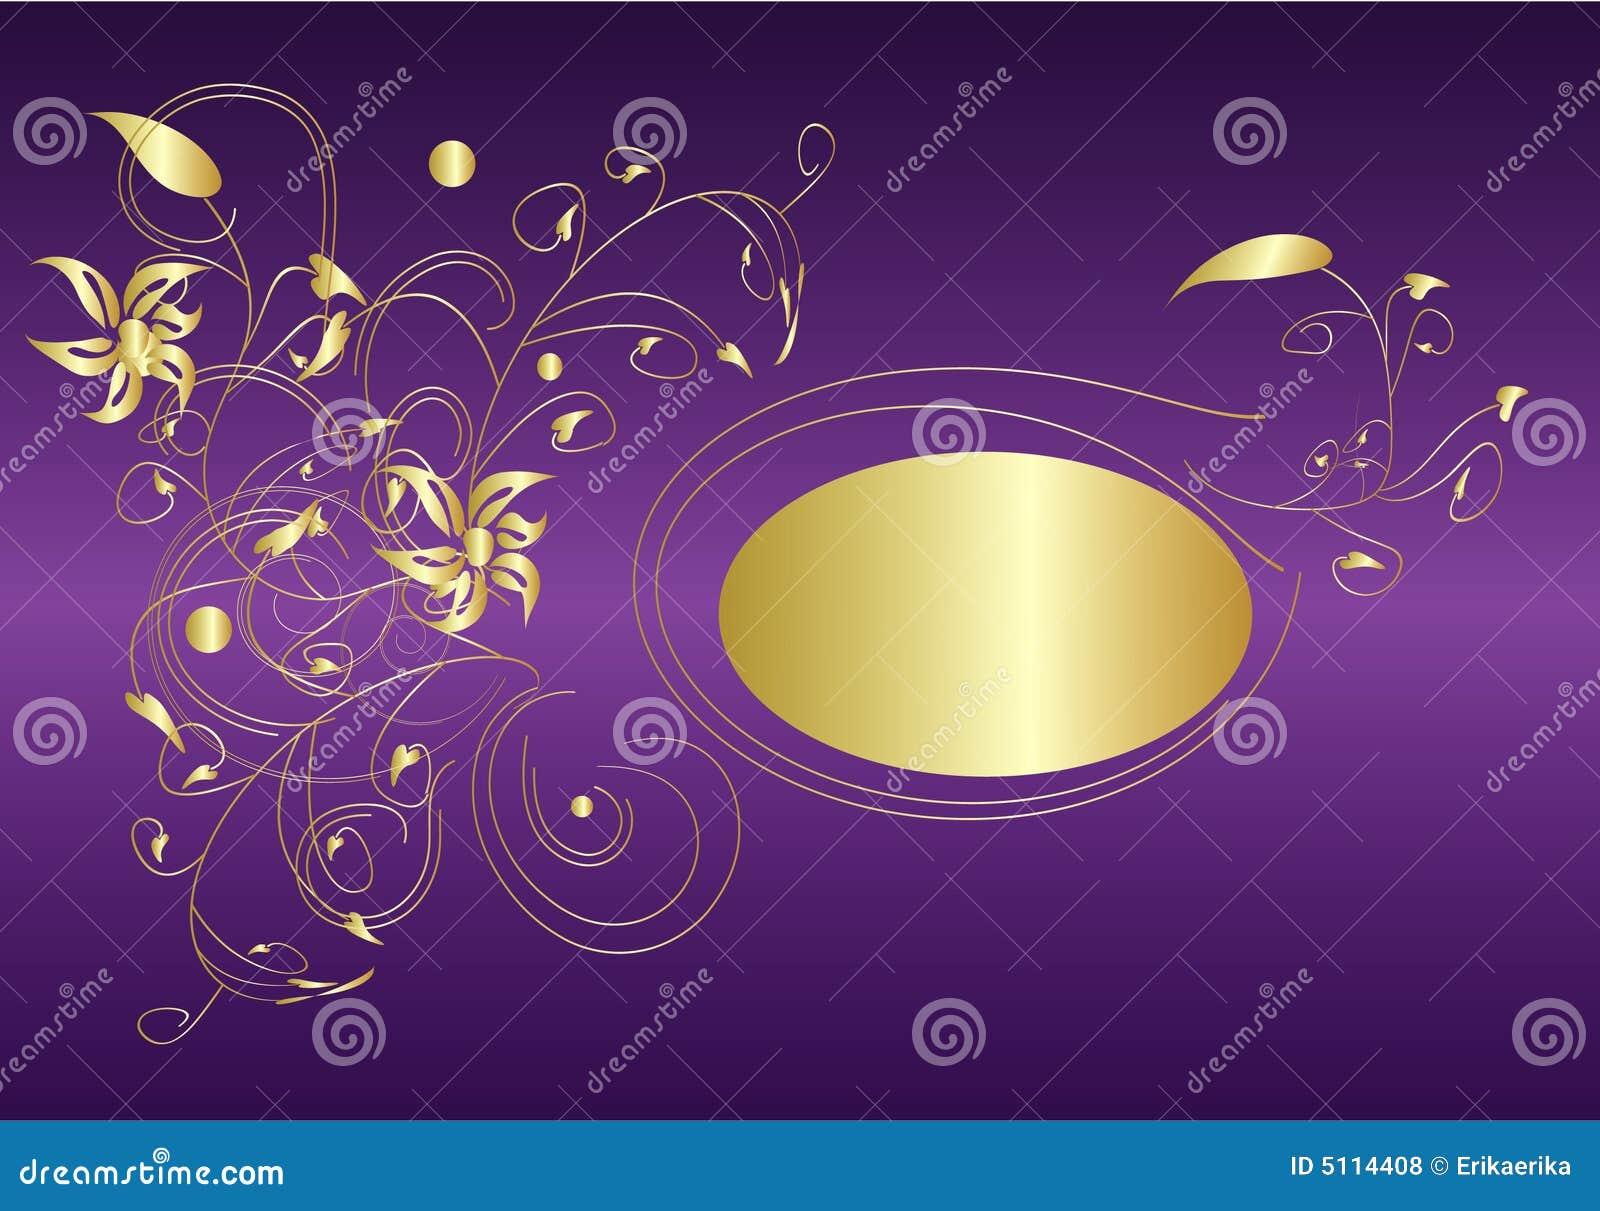 purple and gold stock vector image of greeting leaf. Black Bedroom Furniture Sets. Home Design Ideas